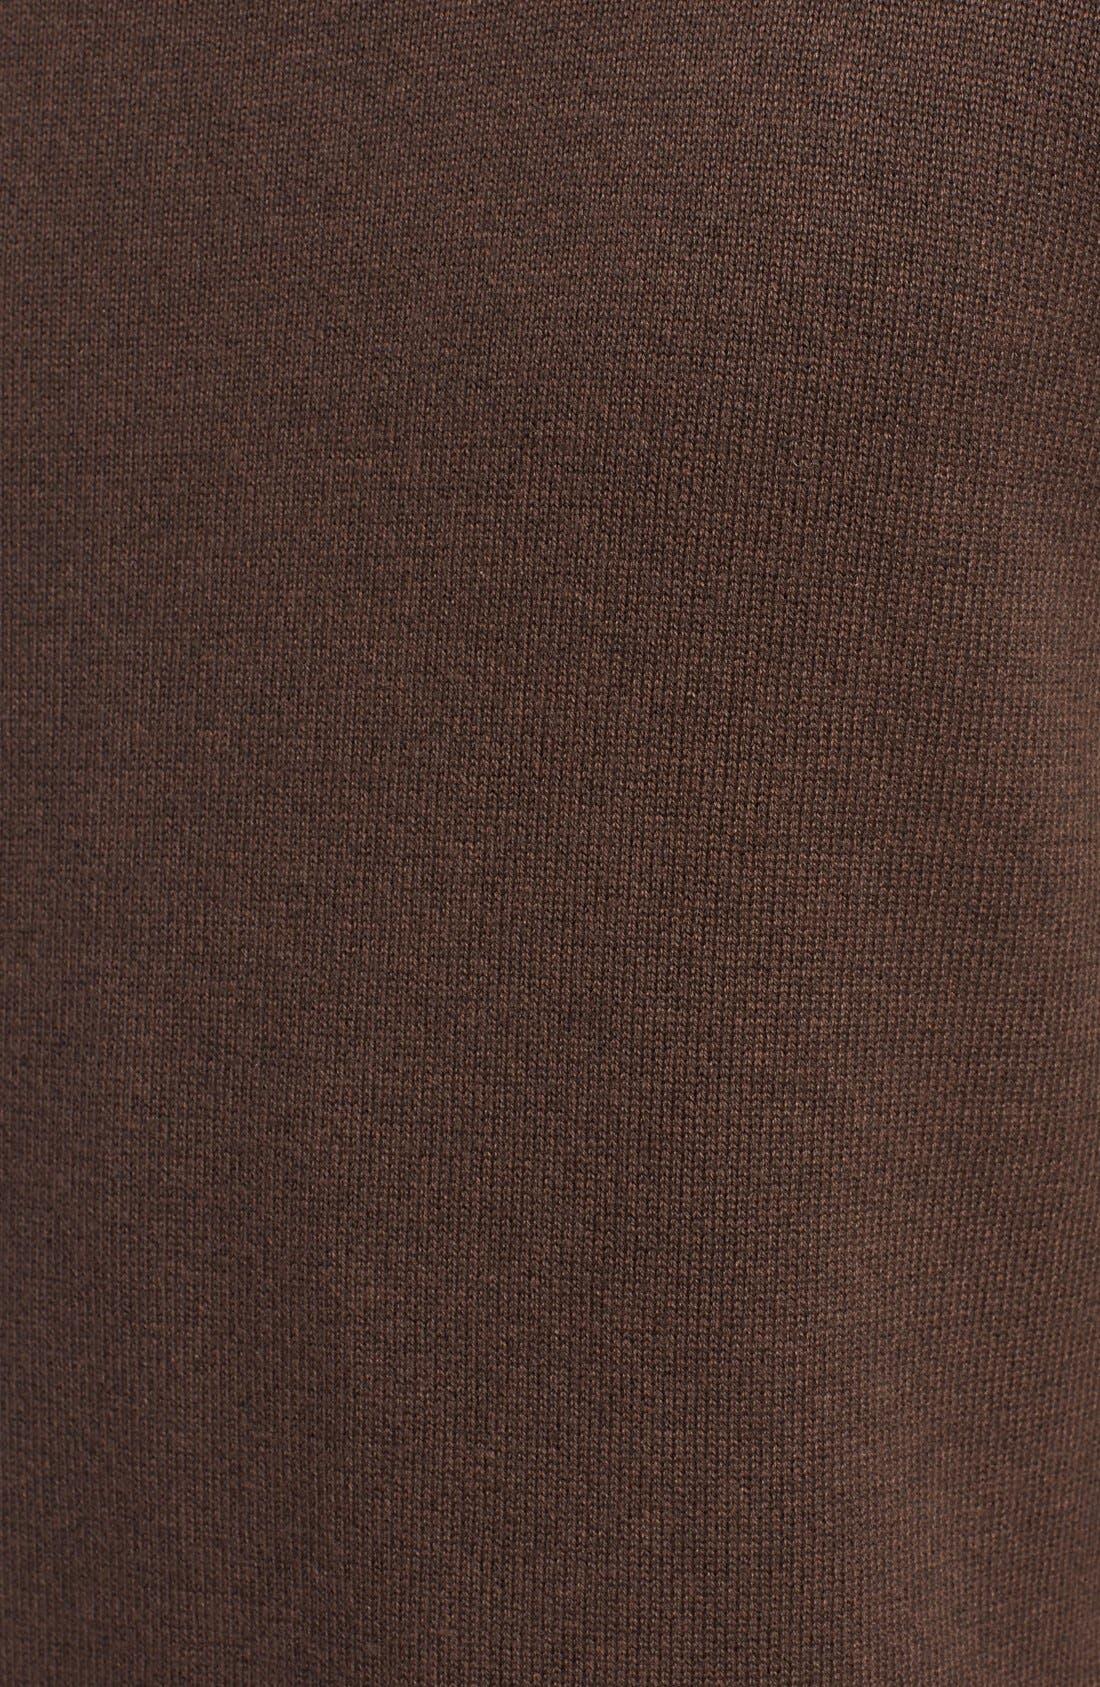 'San Francisco' Crewneck Sweater,                             Alternate thumbnail 5, color,                             245